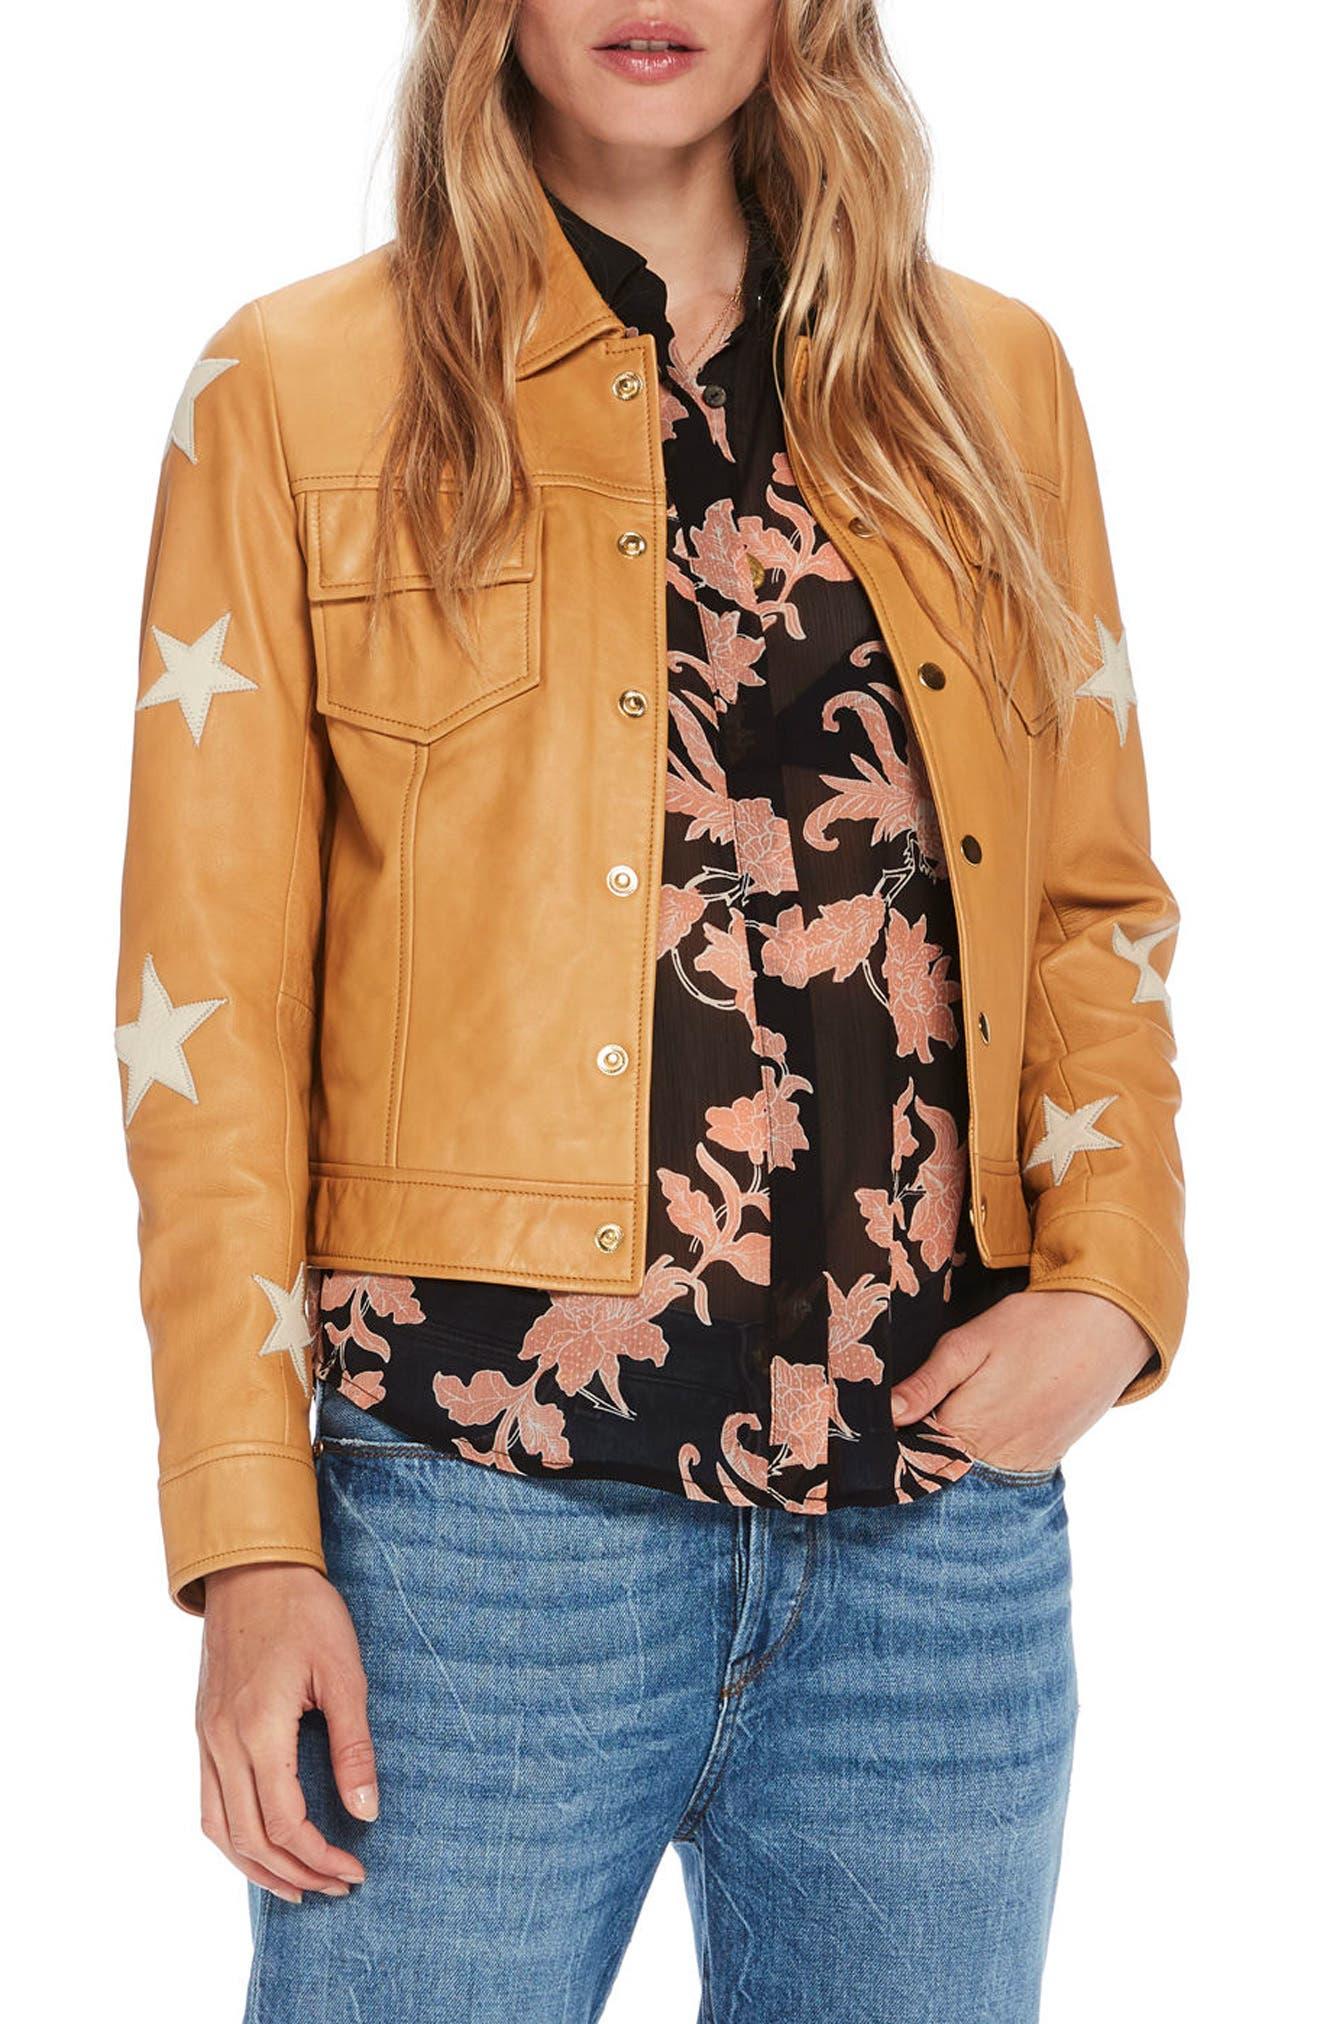 Sheepskin Leather Shirt Jacket,                         Main,                         color, Color 1942 Sahara